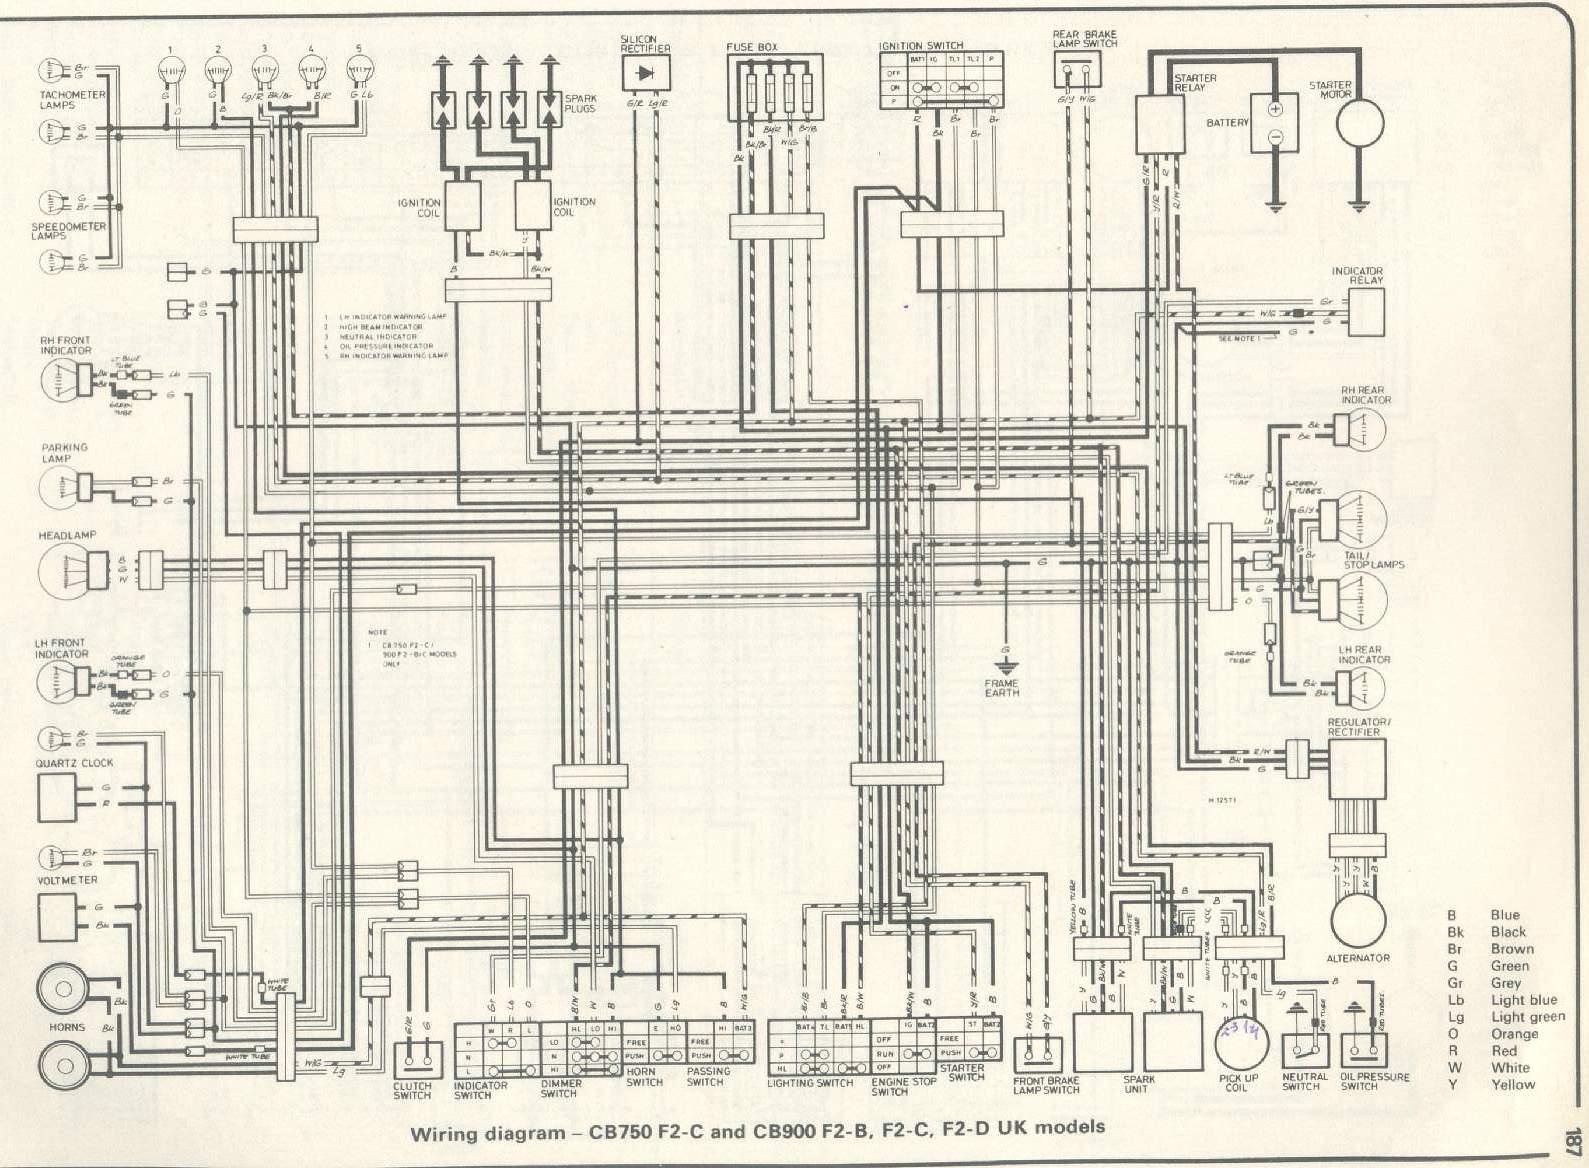 1982 honda cb900 wiring diagram 1982 database wiring 1982 honda cb900 wiring diagram 1982 database wiring diagram images